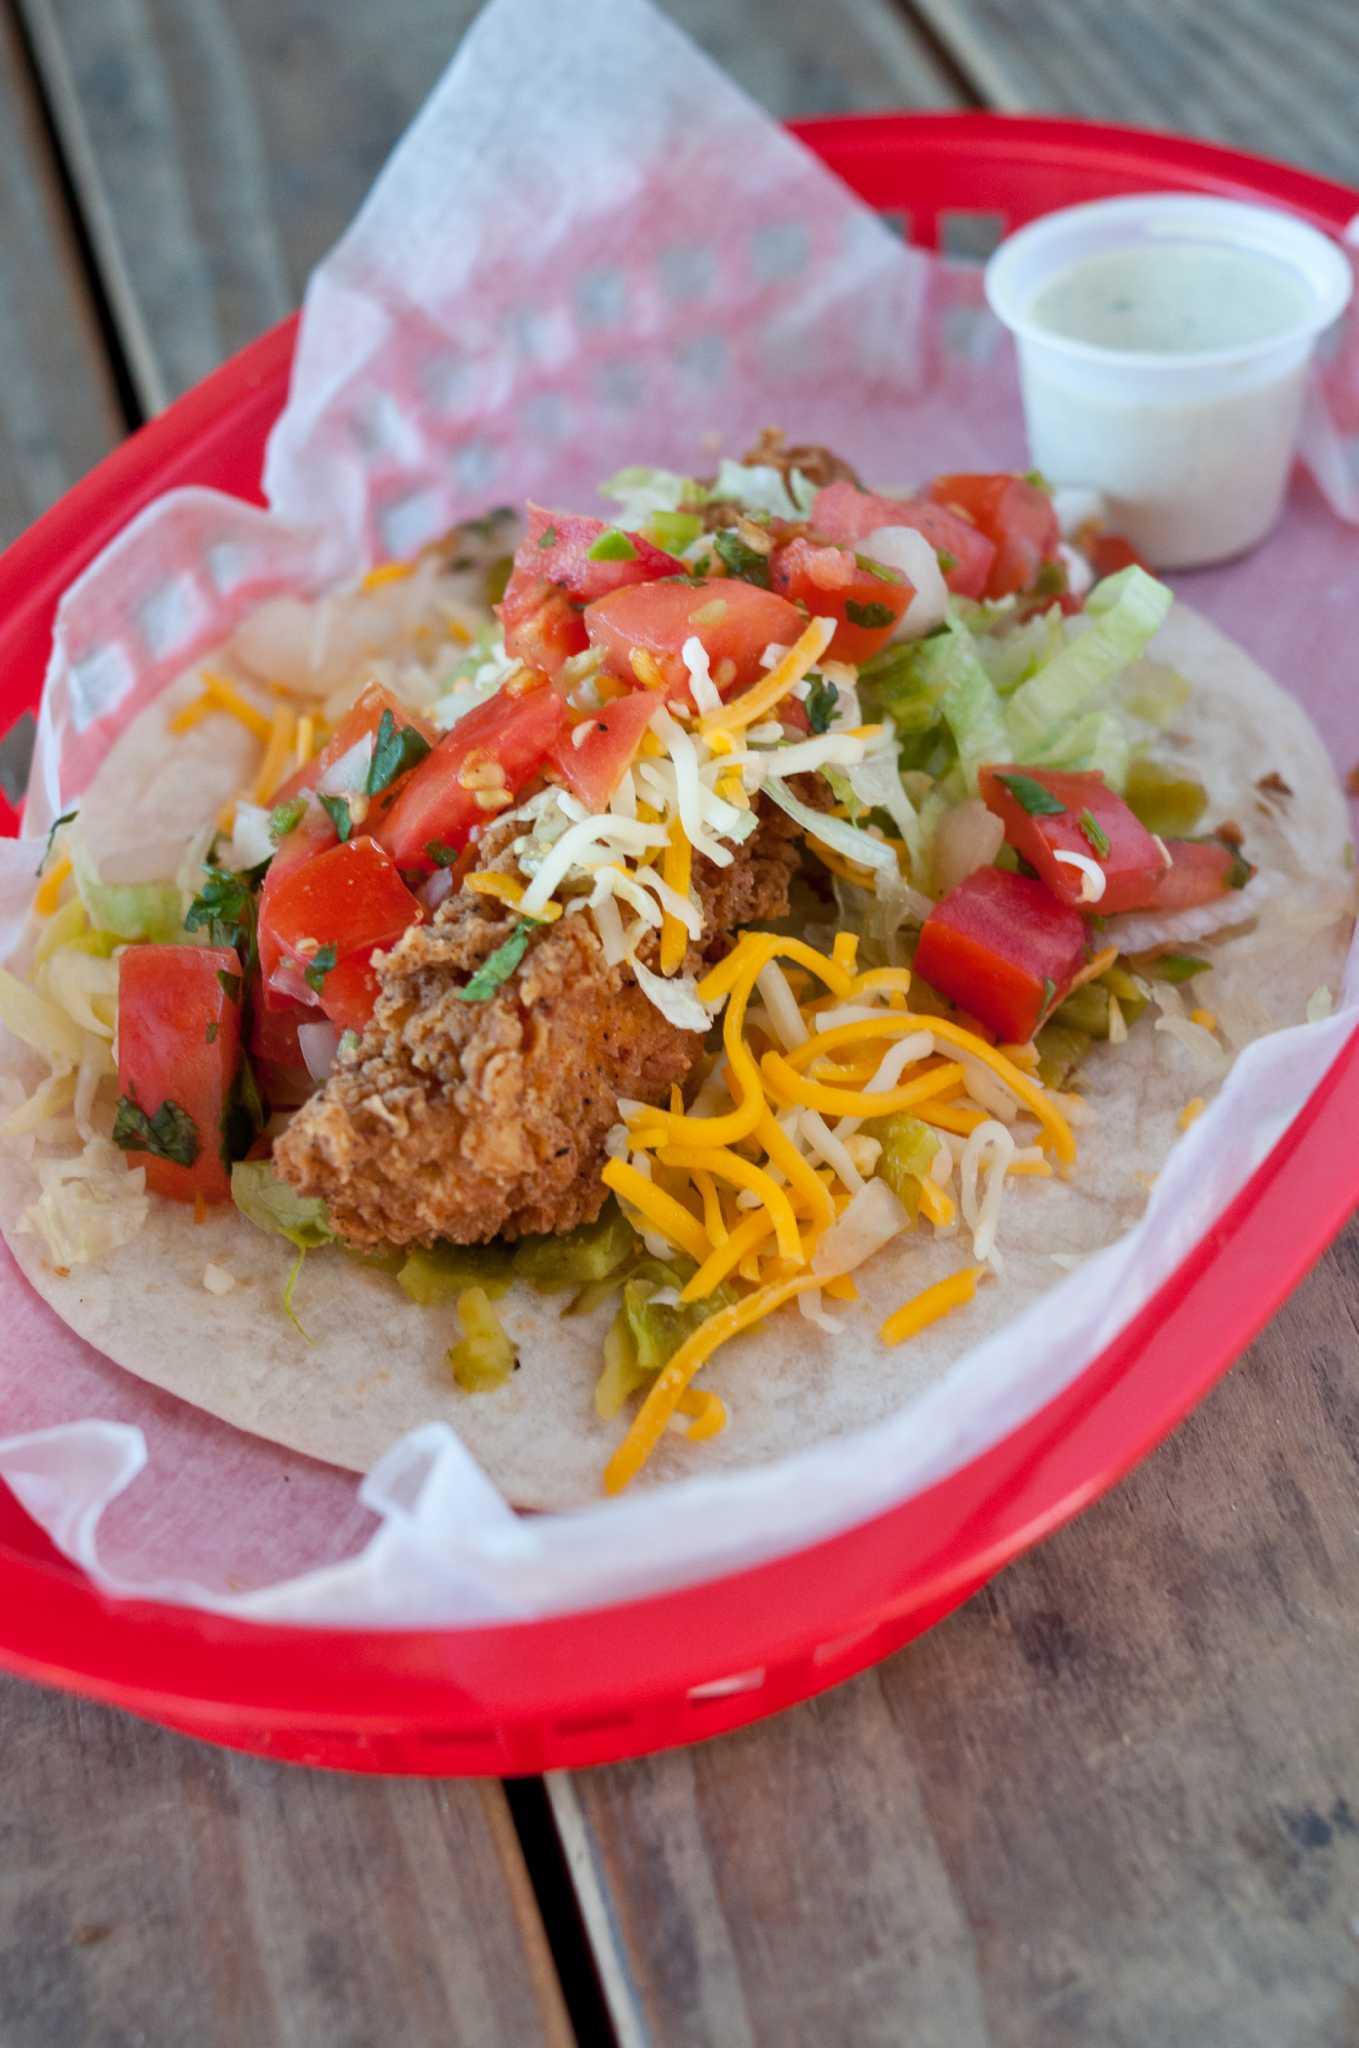 Torchys Tacos Houston Shepherd